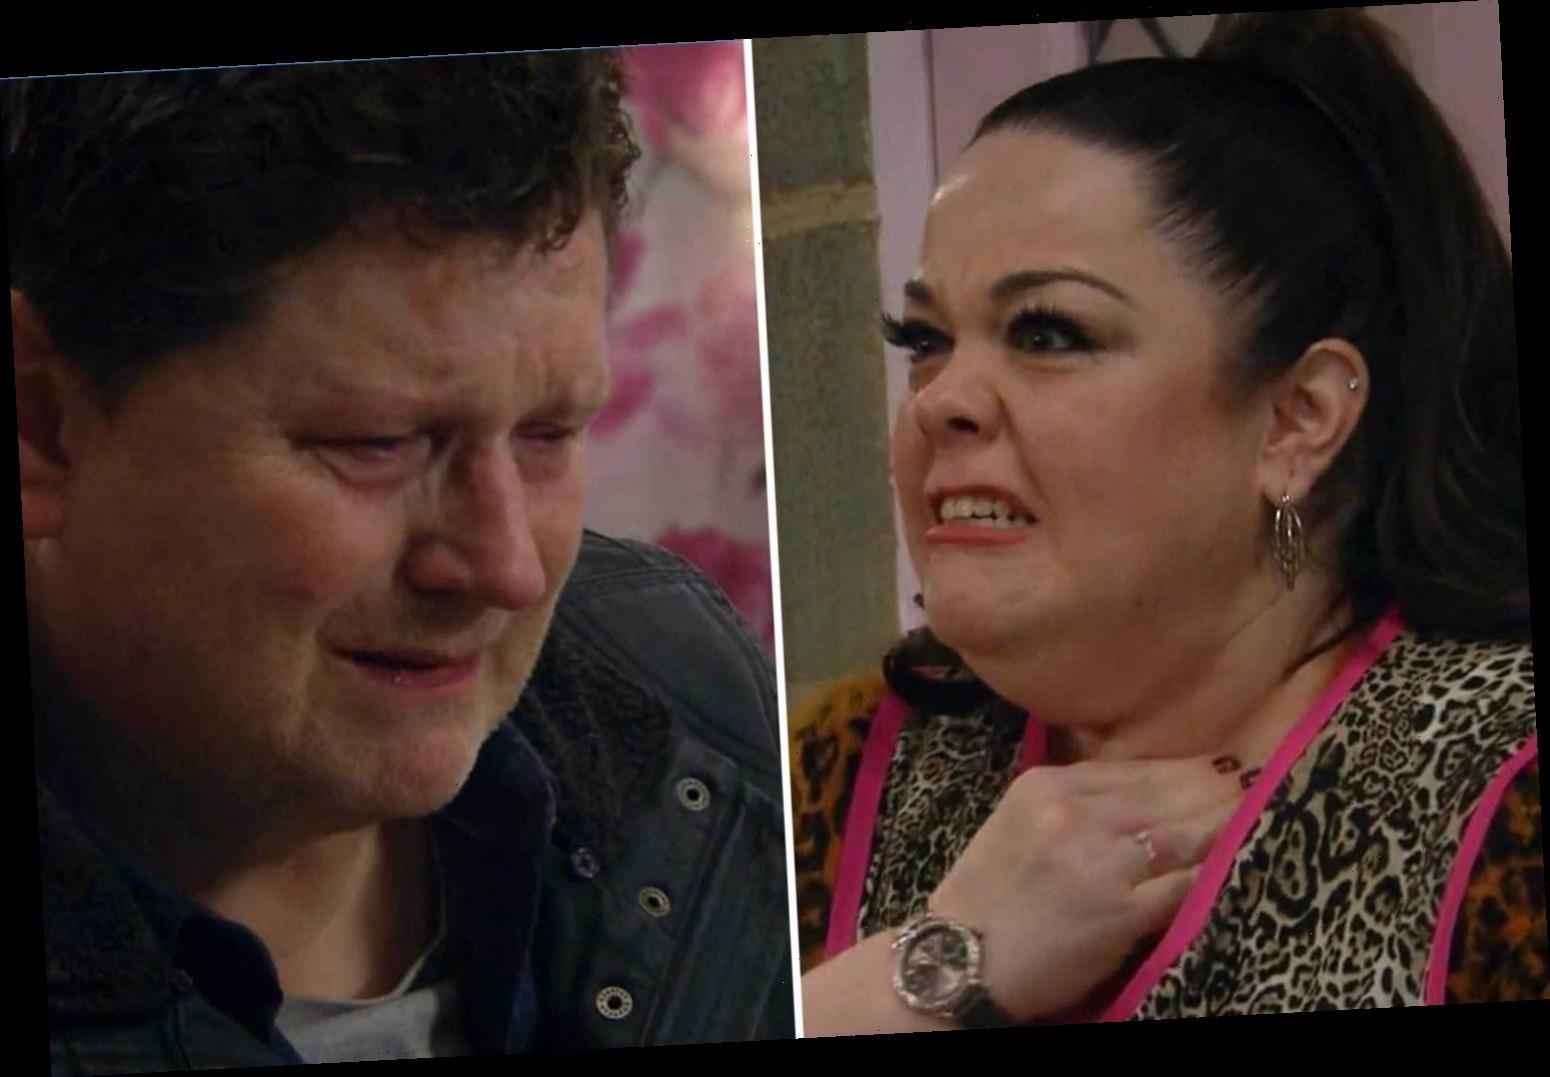 Emmerdale heartbreak for Mandy Dingle as she discovers Paul is gambling again